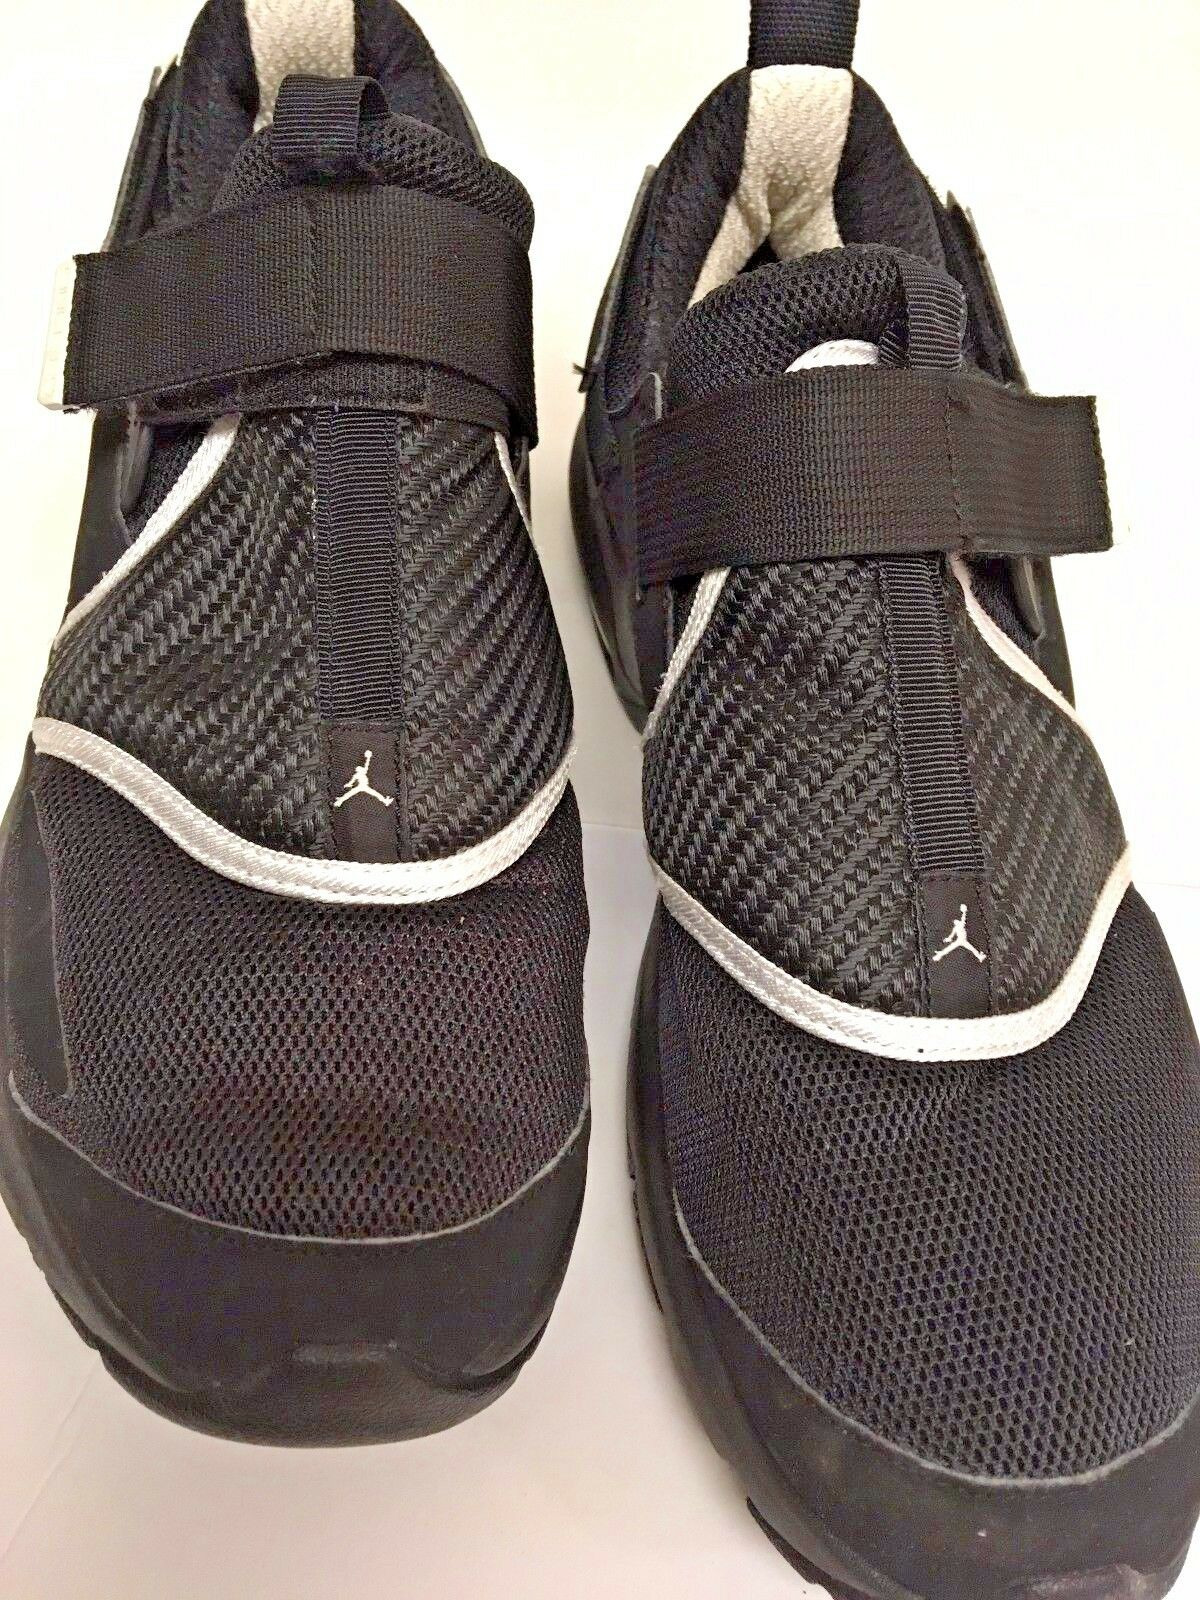 Nike air trunner jordan trunner air lx 2011 nero argento scarpe da ginnastica jordan sz 10,5 m a84163